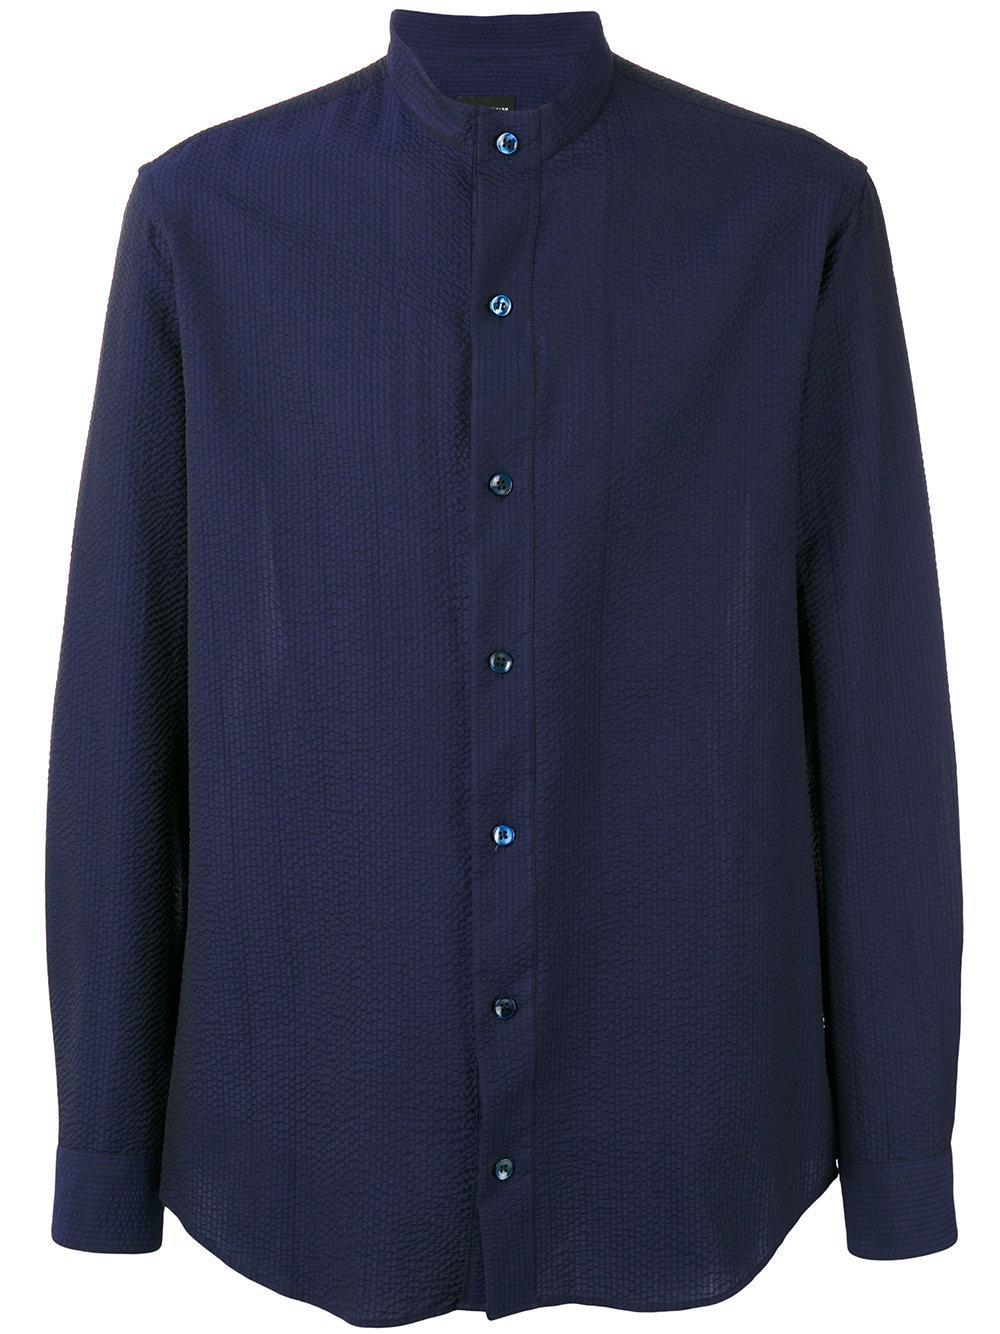 Giorgio armani seersucker mandarin collar shirt in blue for Chinese collar shirts for men